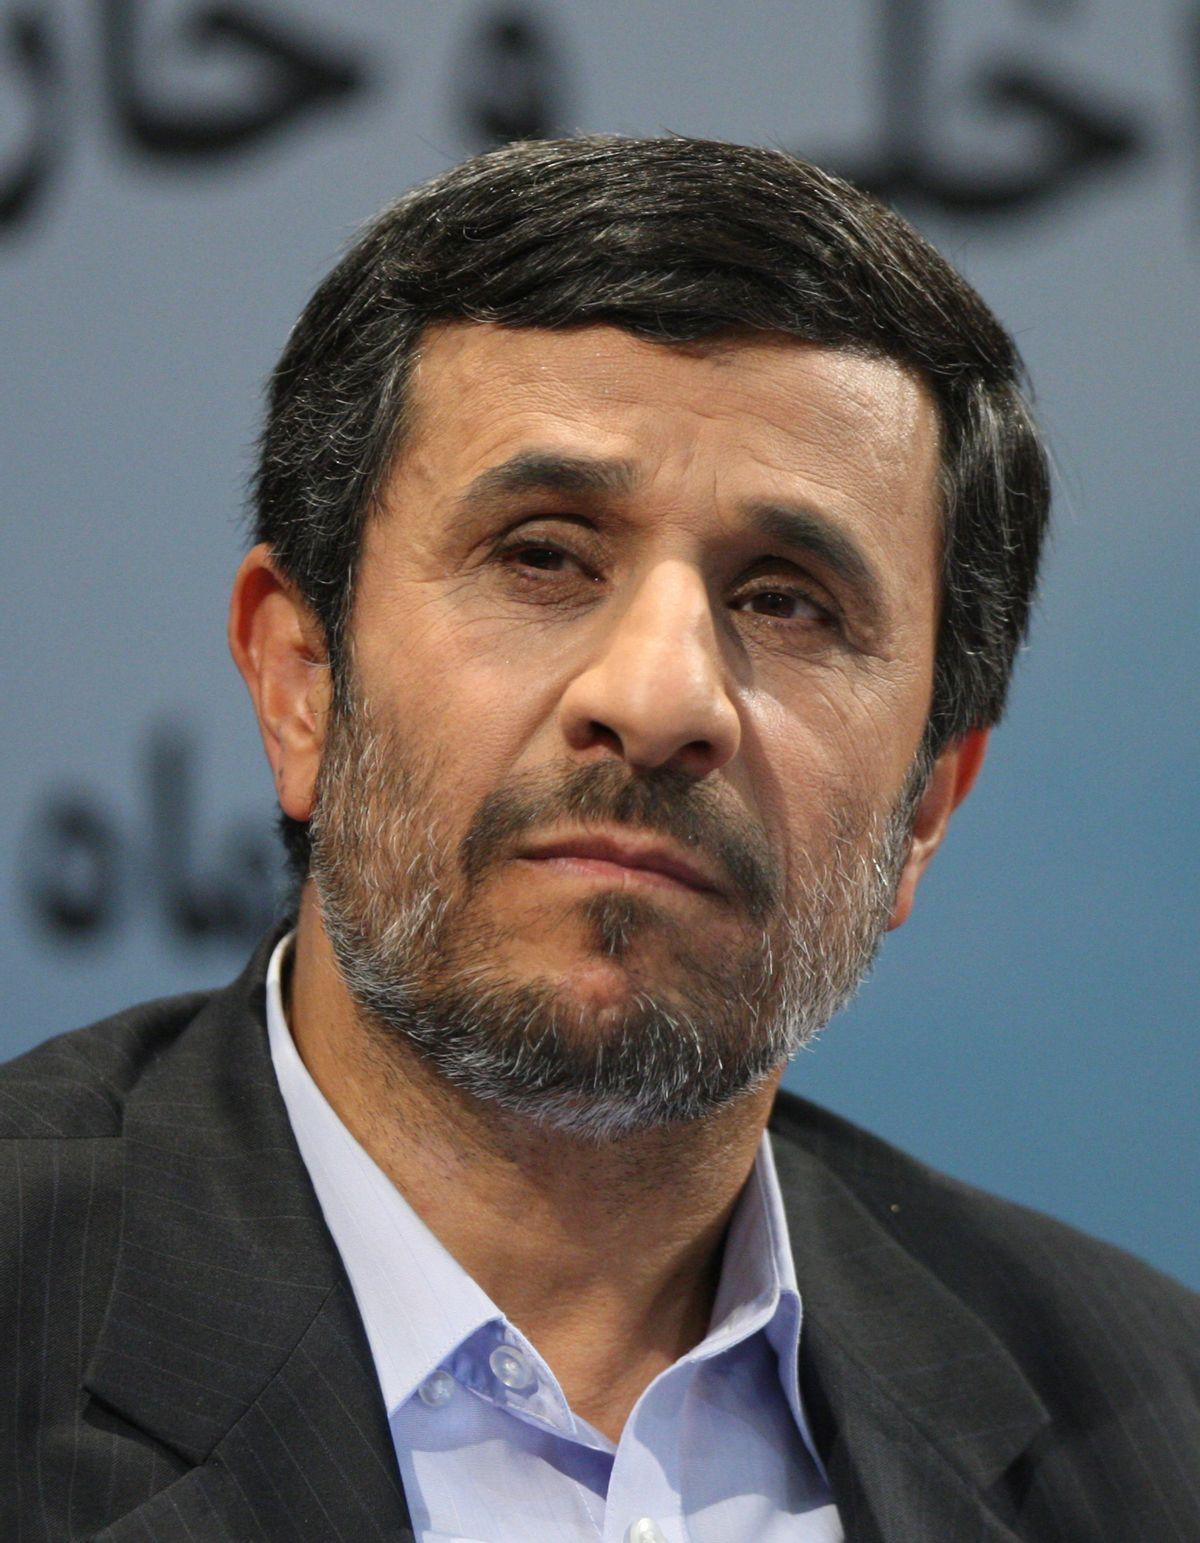 Iranian President Mahmoud Ahmadinejad listens to a question during his press conference in Tehran, Iran, Monday, Nov. 29, 2010. (AP Photo/Vahid Salemi) (Associated Press)